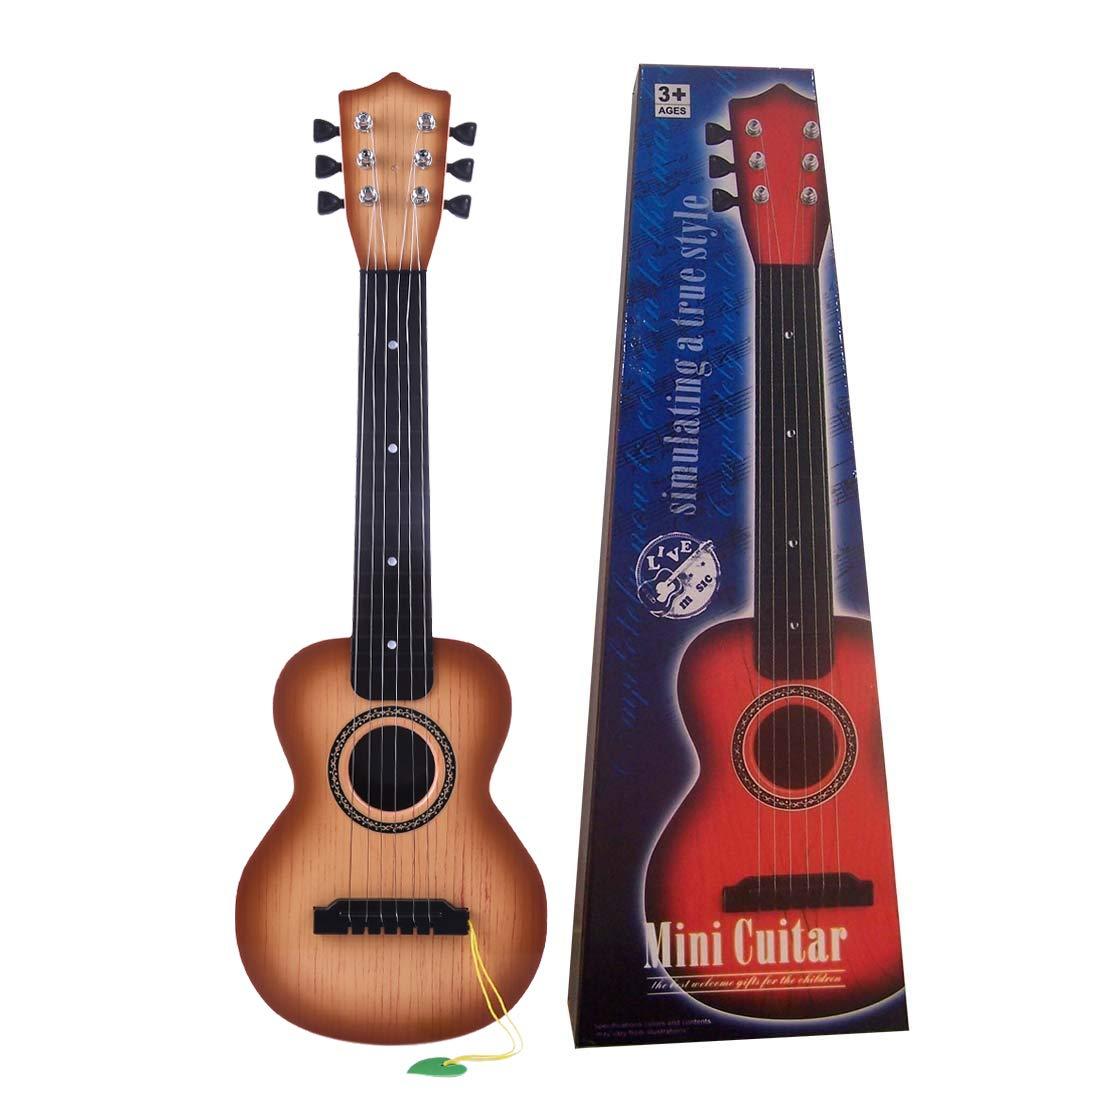 Guitar For 5 Year Old : ruiyif kids guitar toddler toy guitars for boys girls age 3 5 years old 6 690001595324 ebay ~ Russianpoet.info Haus und Dekorationen